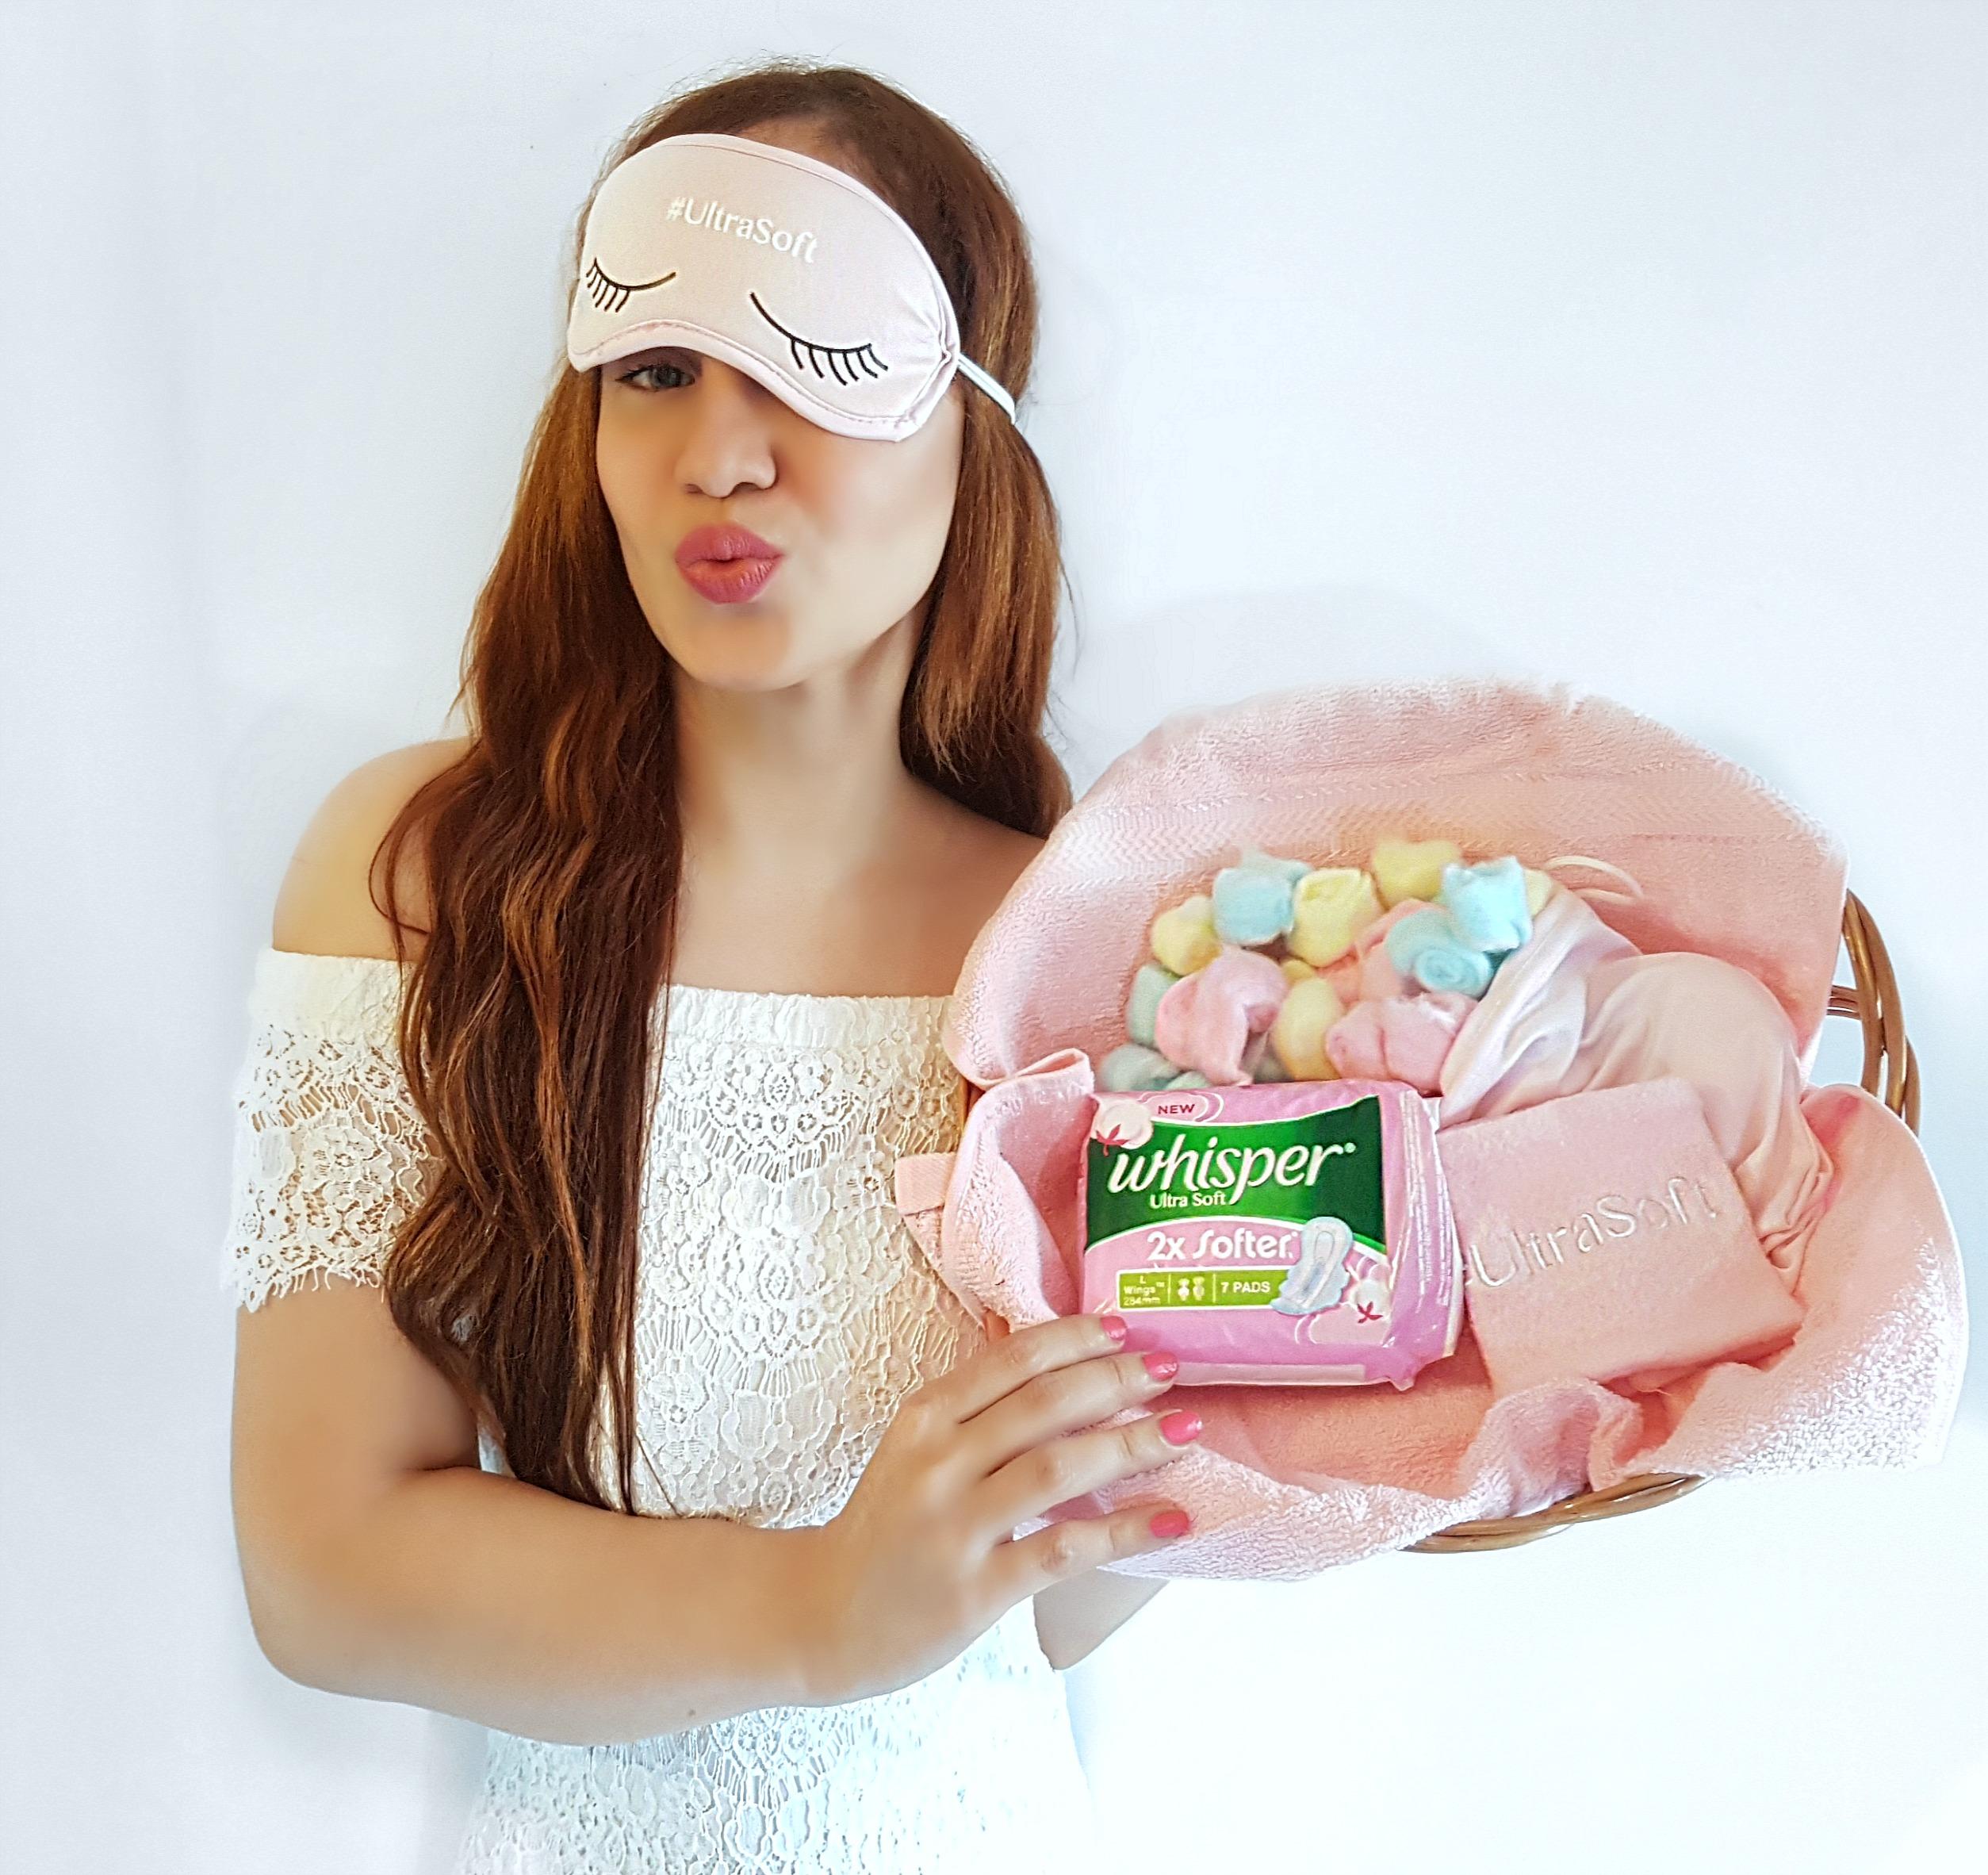 New Whisper Ultra Soft,sanitary napkins